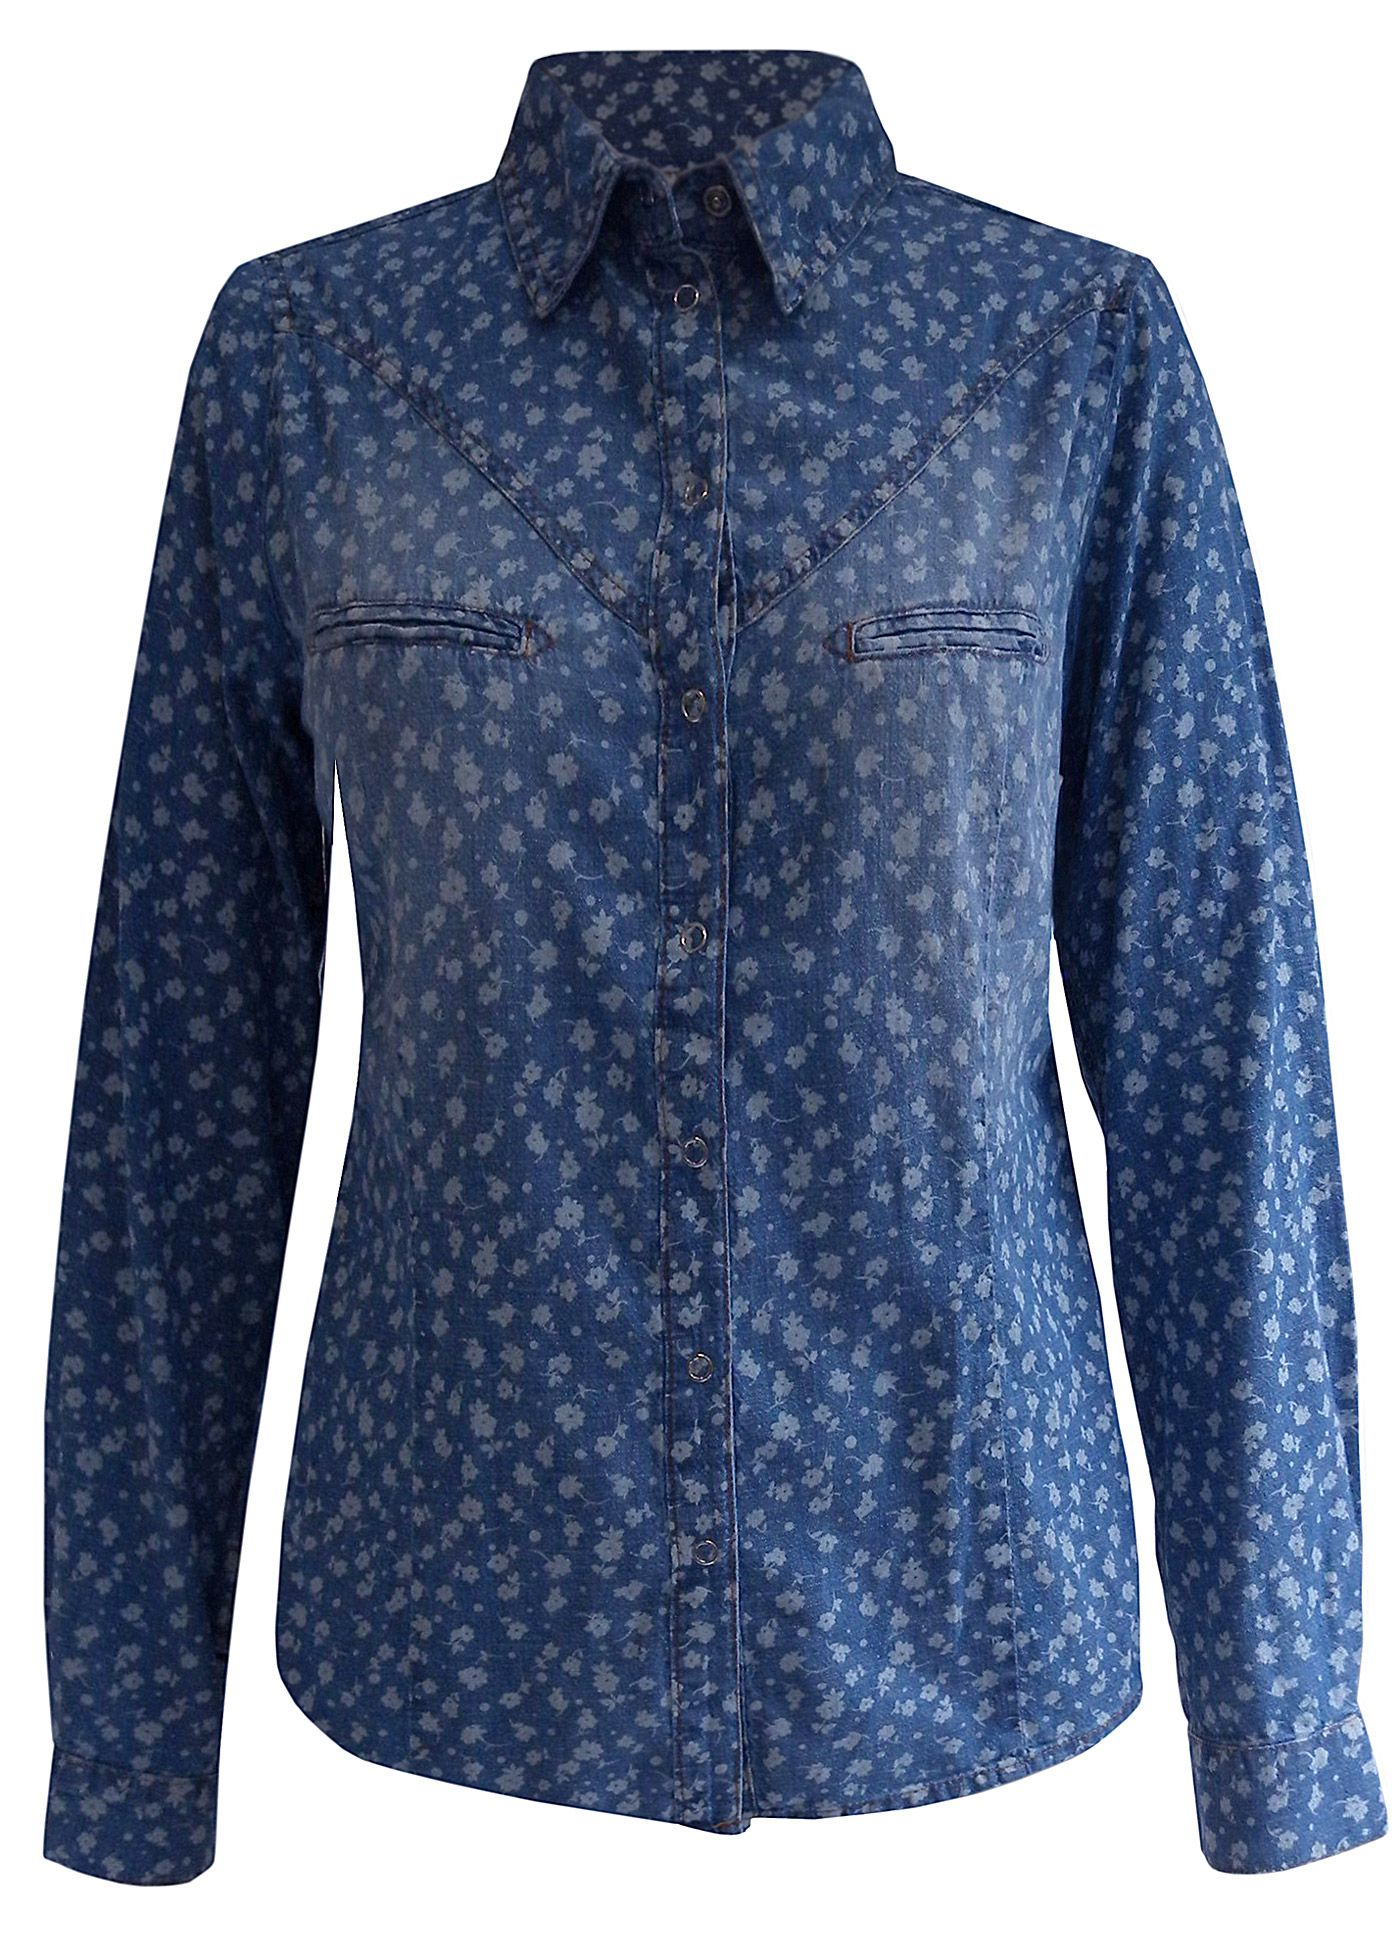 1818f596a9 Camisa jeans estampada